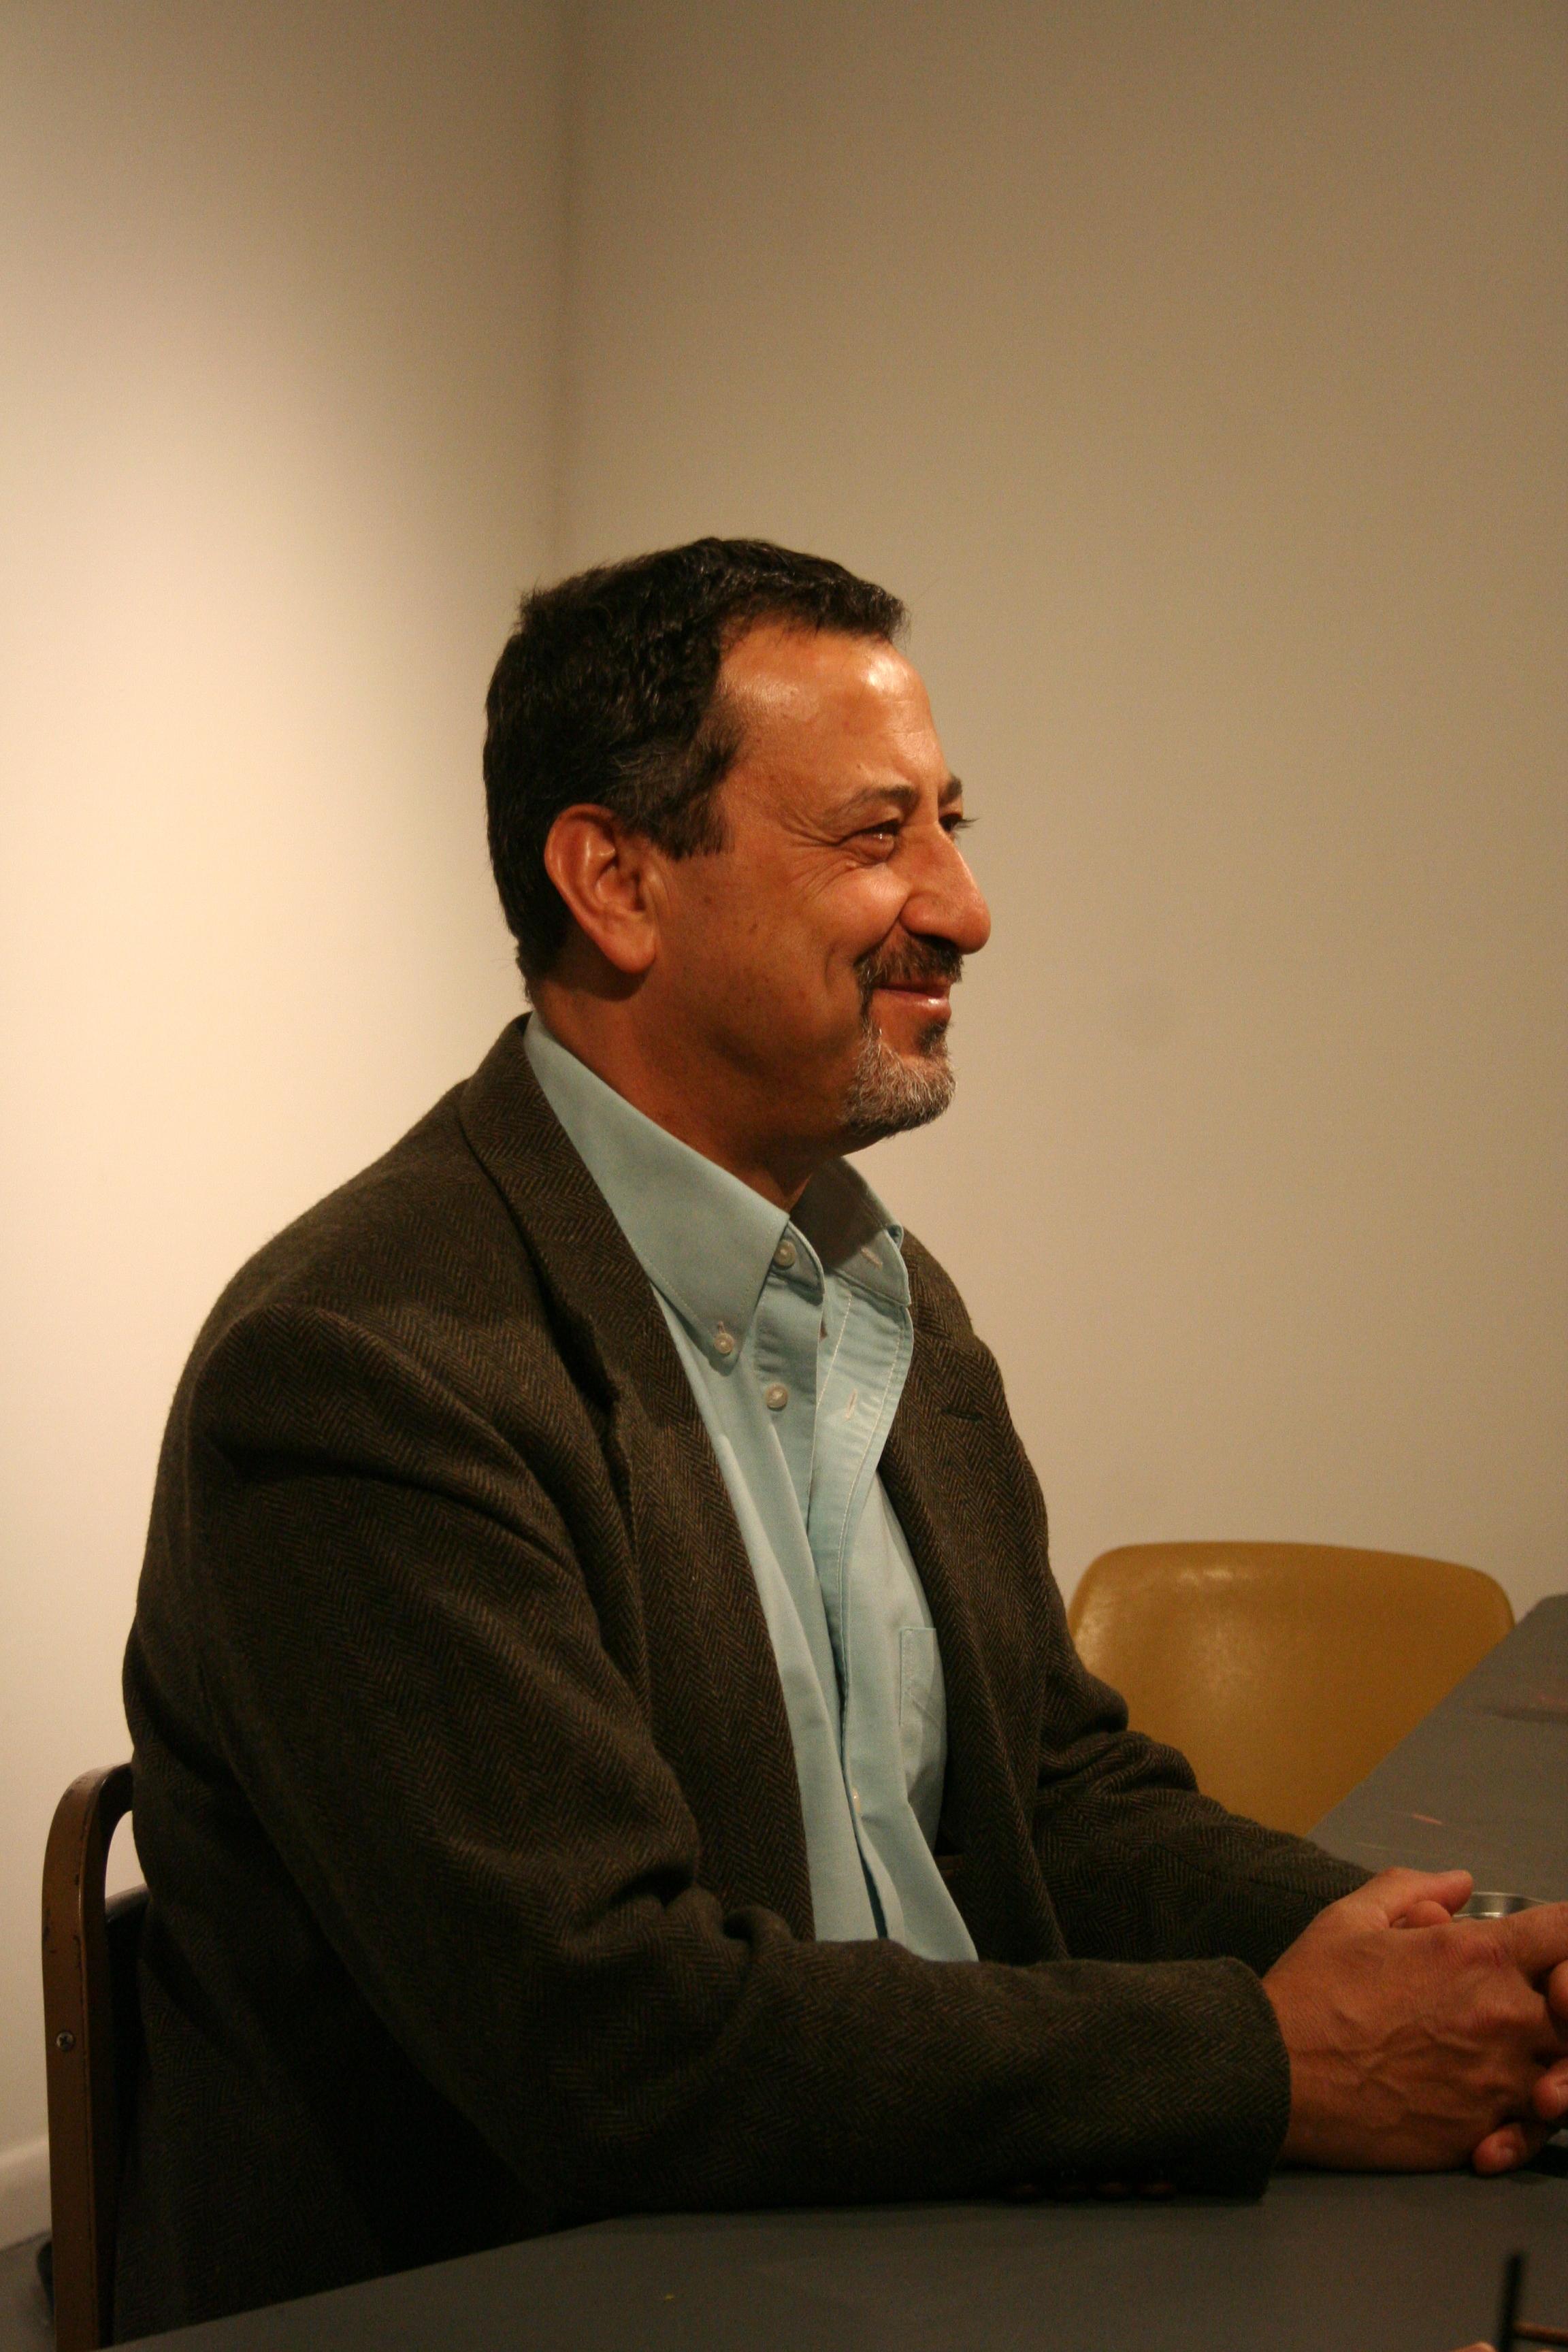 Profile of Hussein